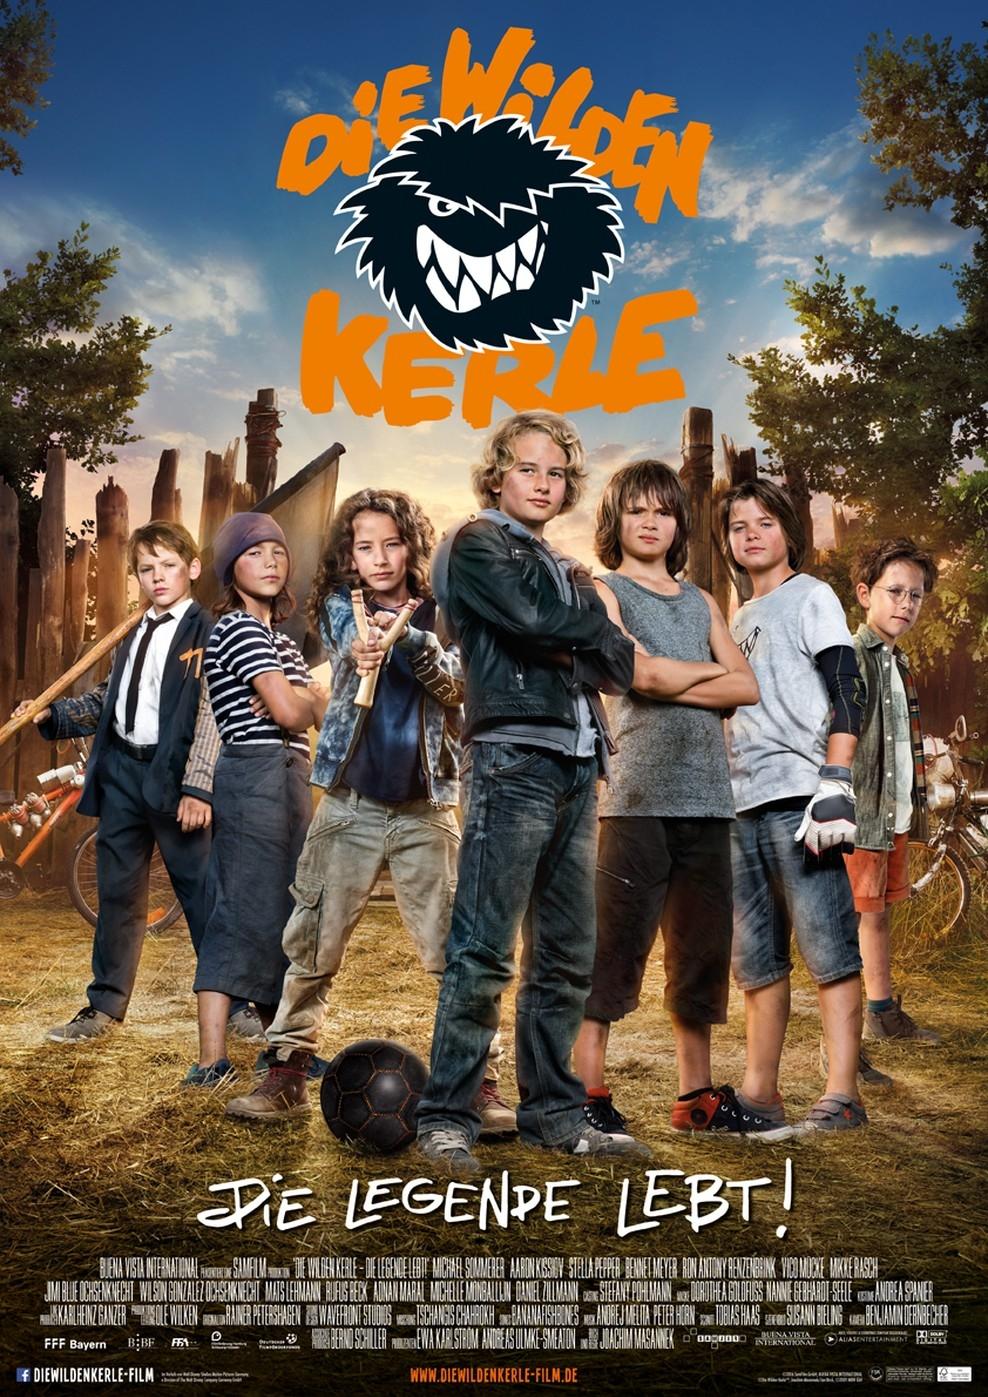 Die wilden Kerle - Die Legende lebt (Poster)